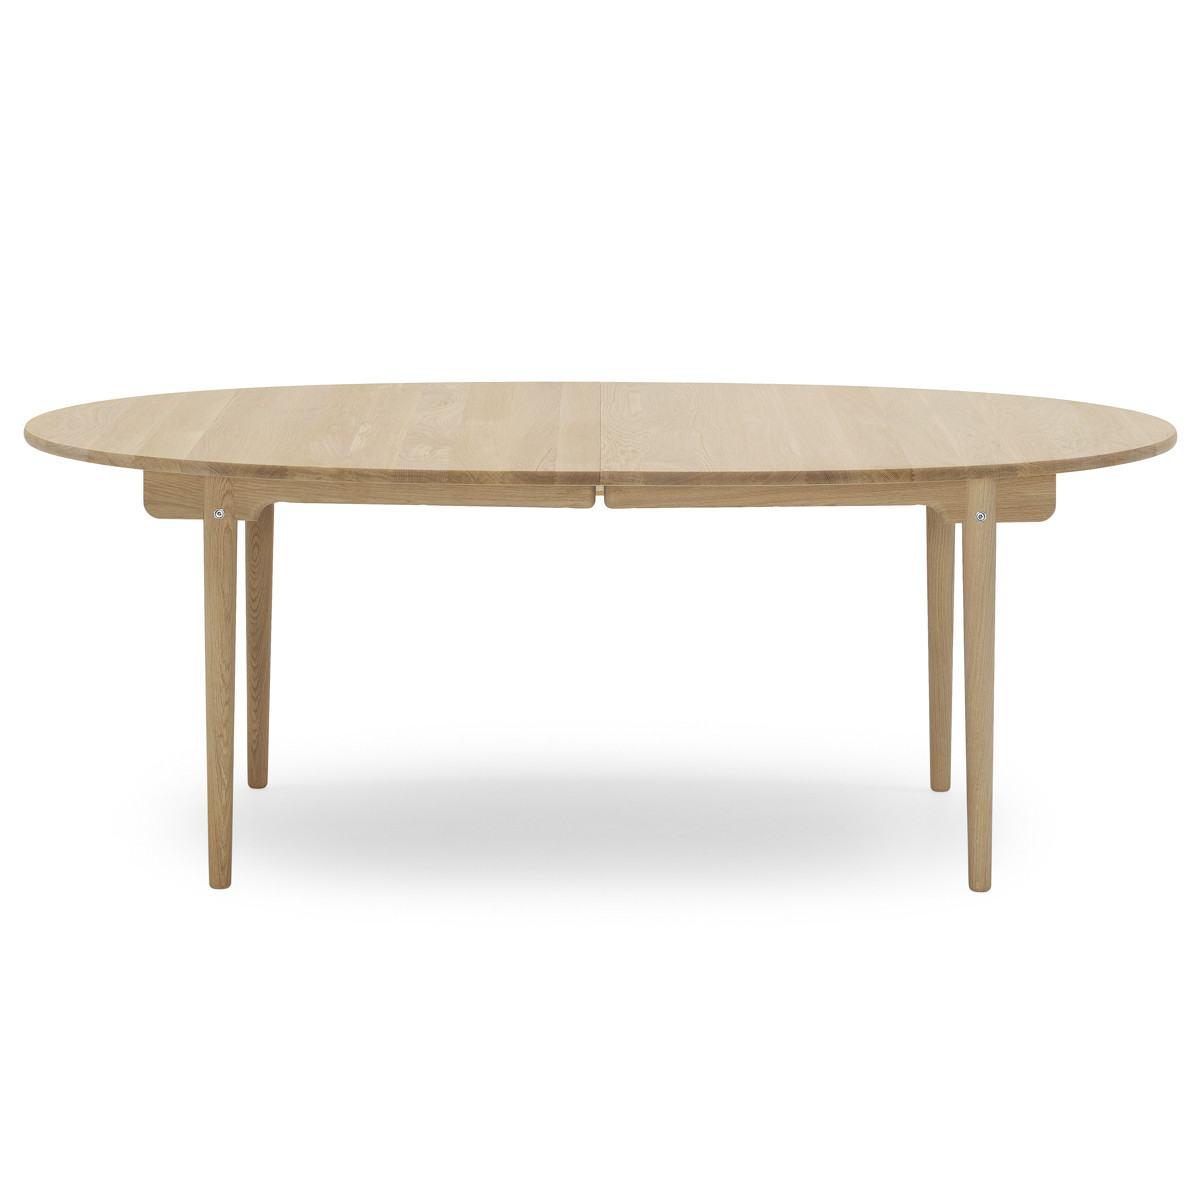 Carl Hansen CH338 Dining Table